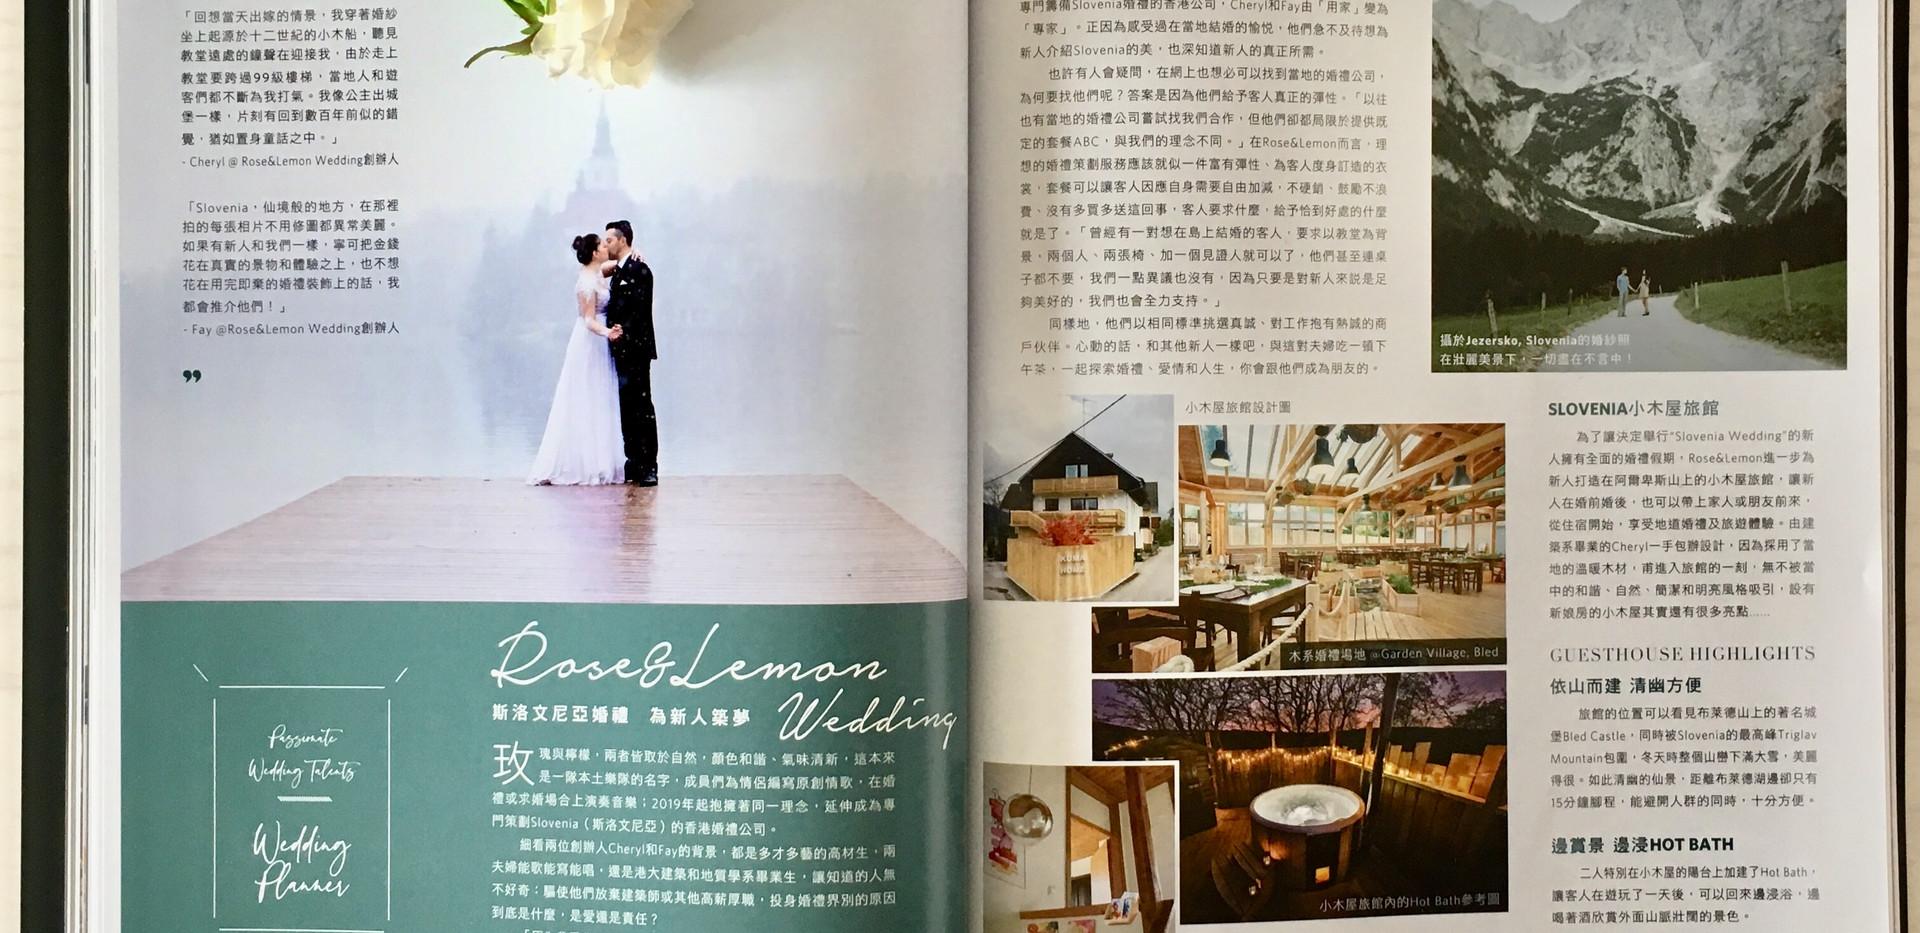 hk wedding magazine research wedding.JPG